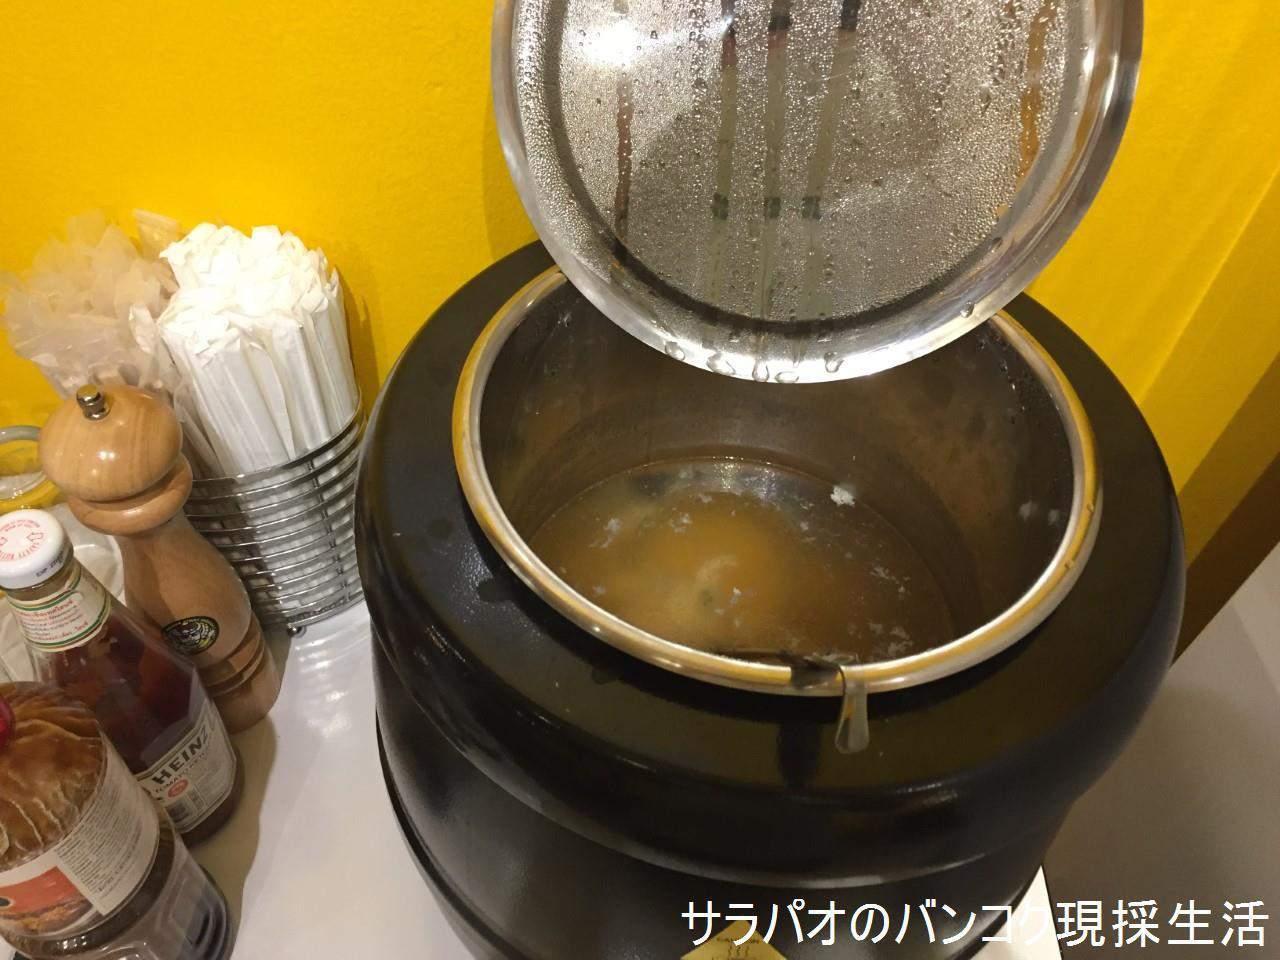 CurryShogun_09.jpg